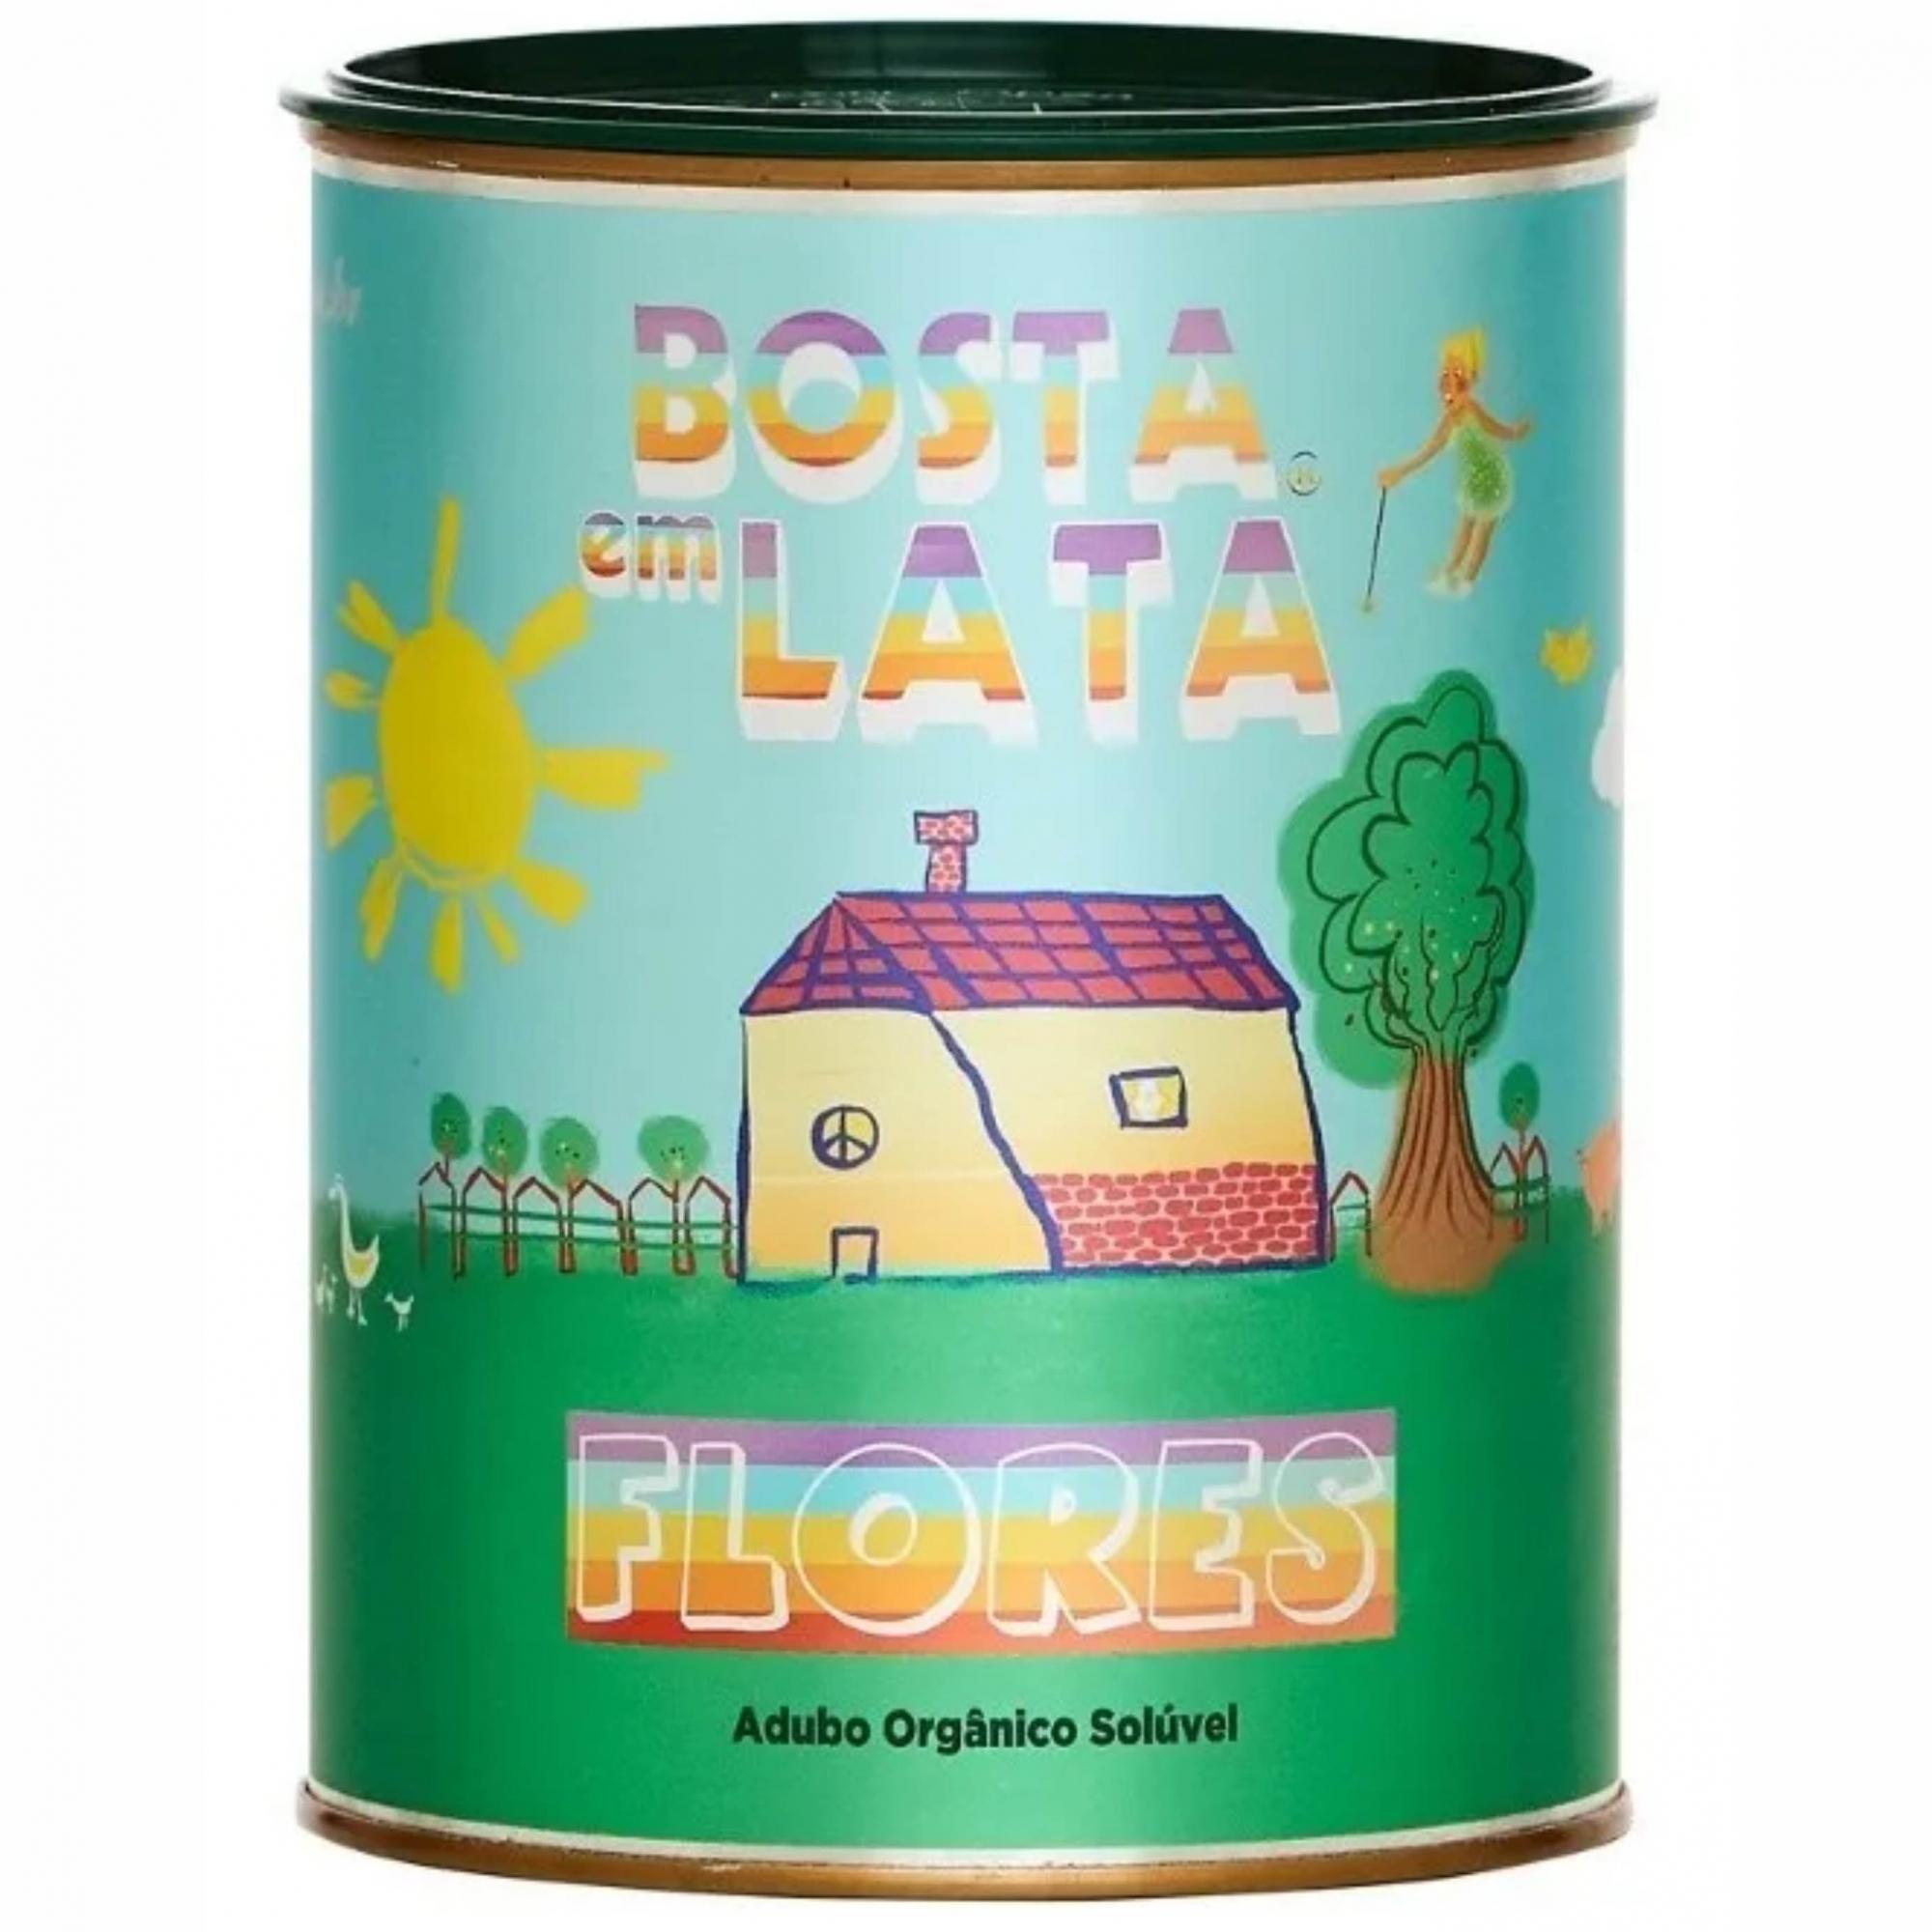 Fertilizante Organico p/Horta Bosta em Lata 500g